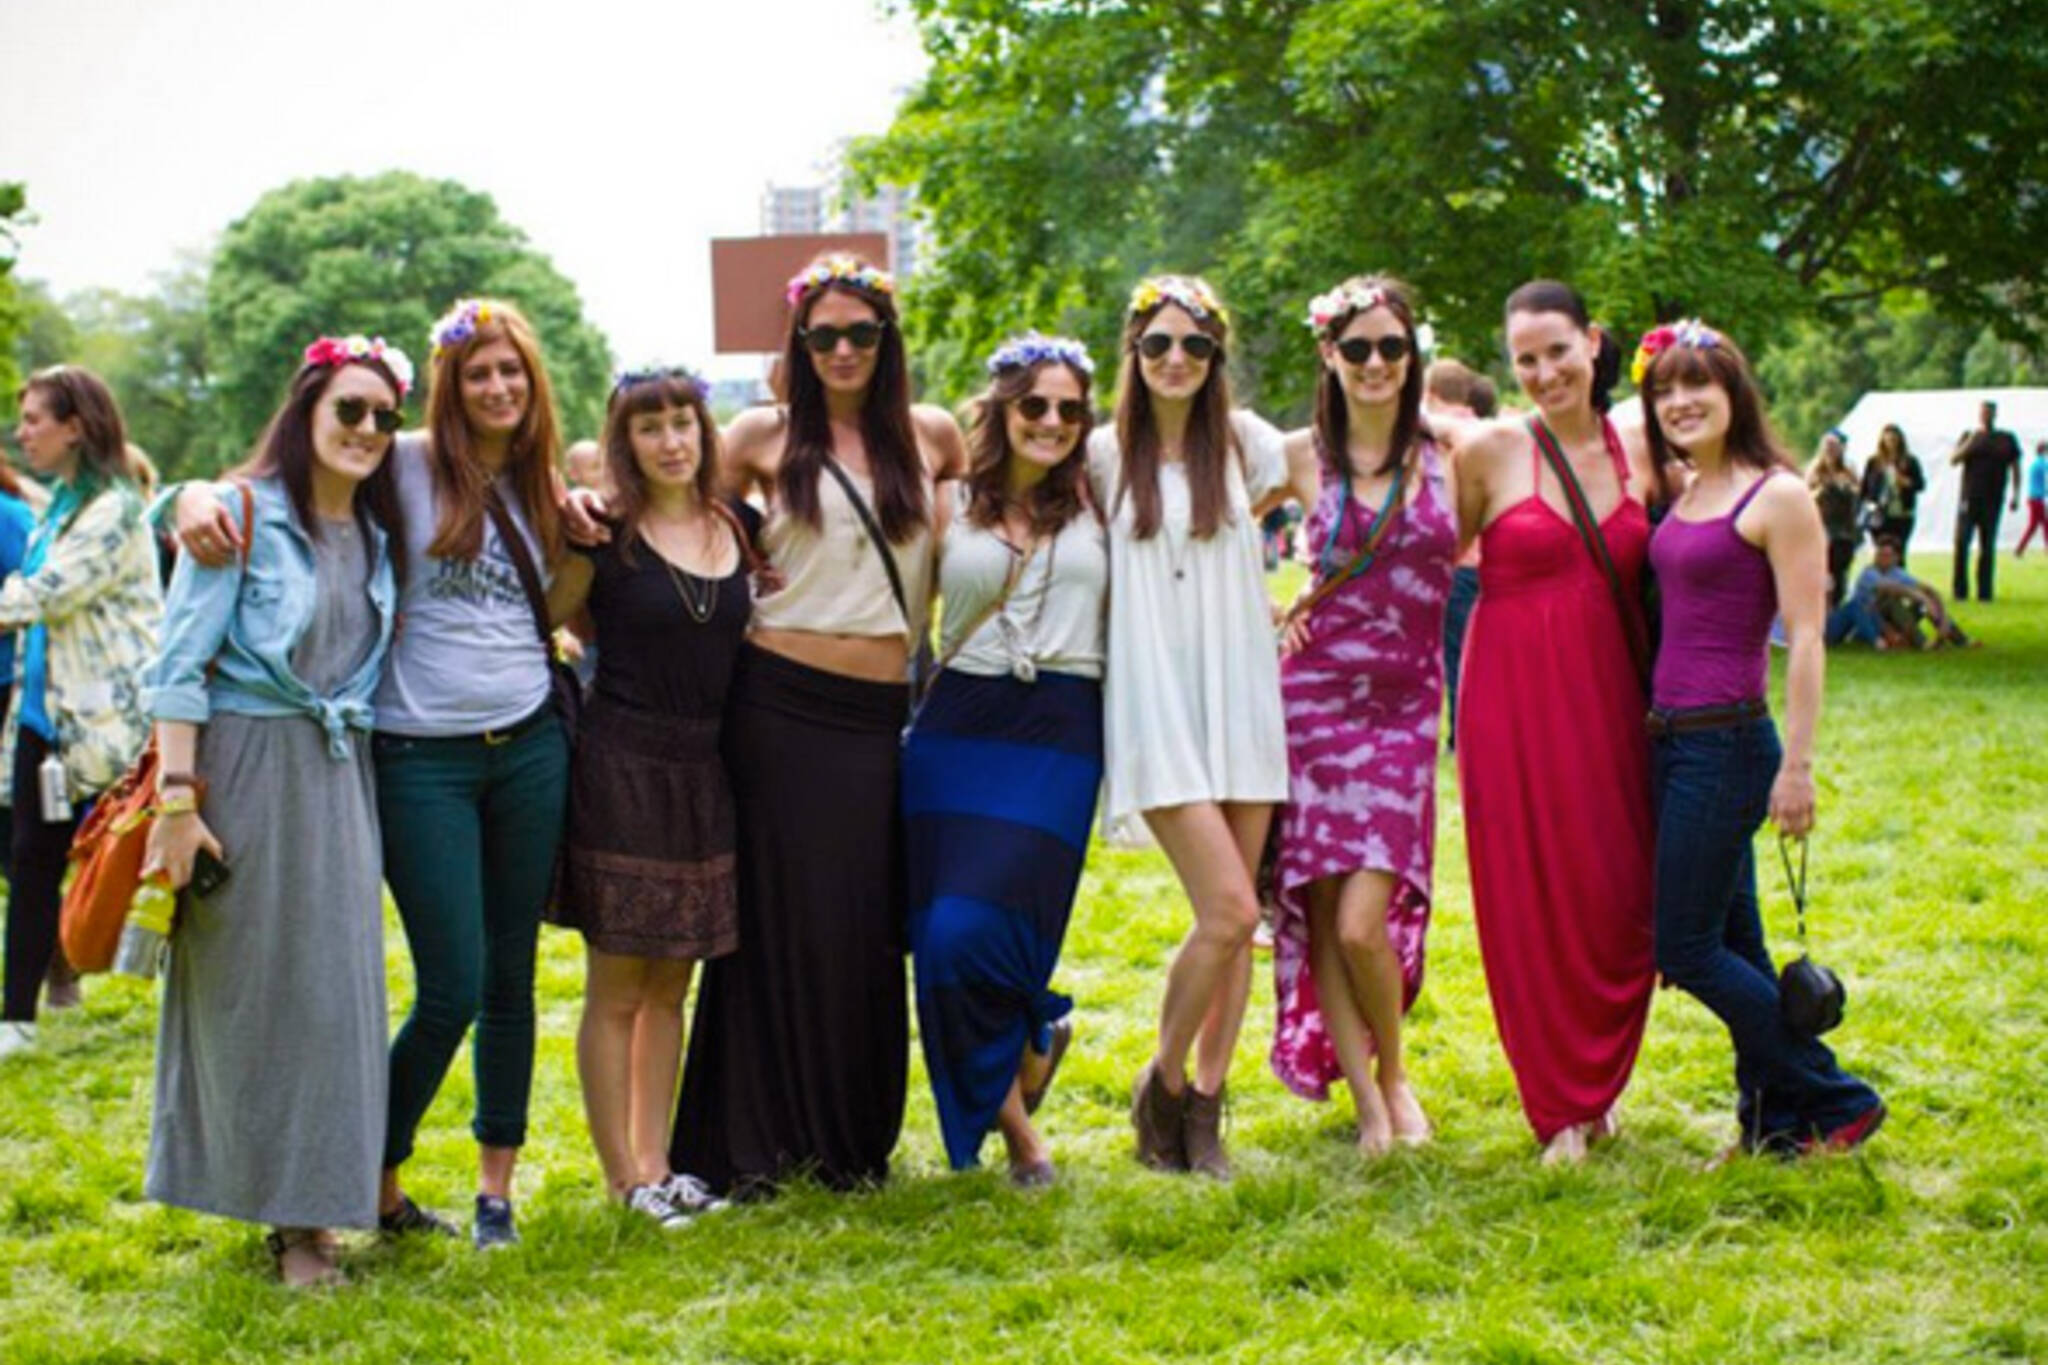 Summer Music Festival Fashion